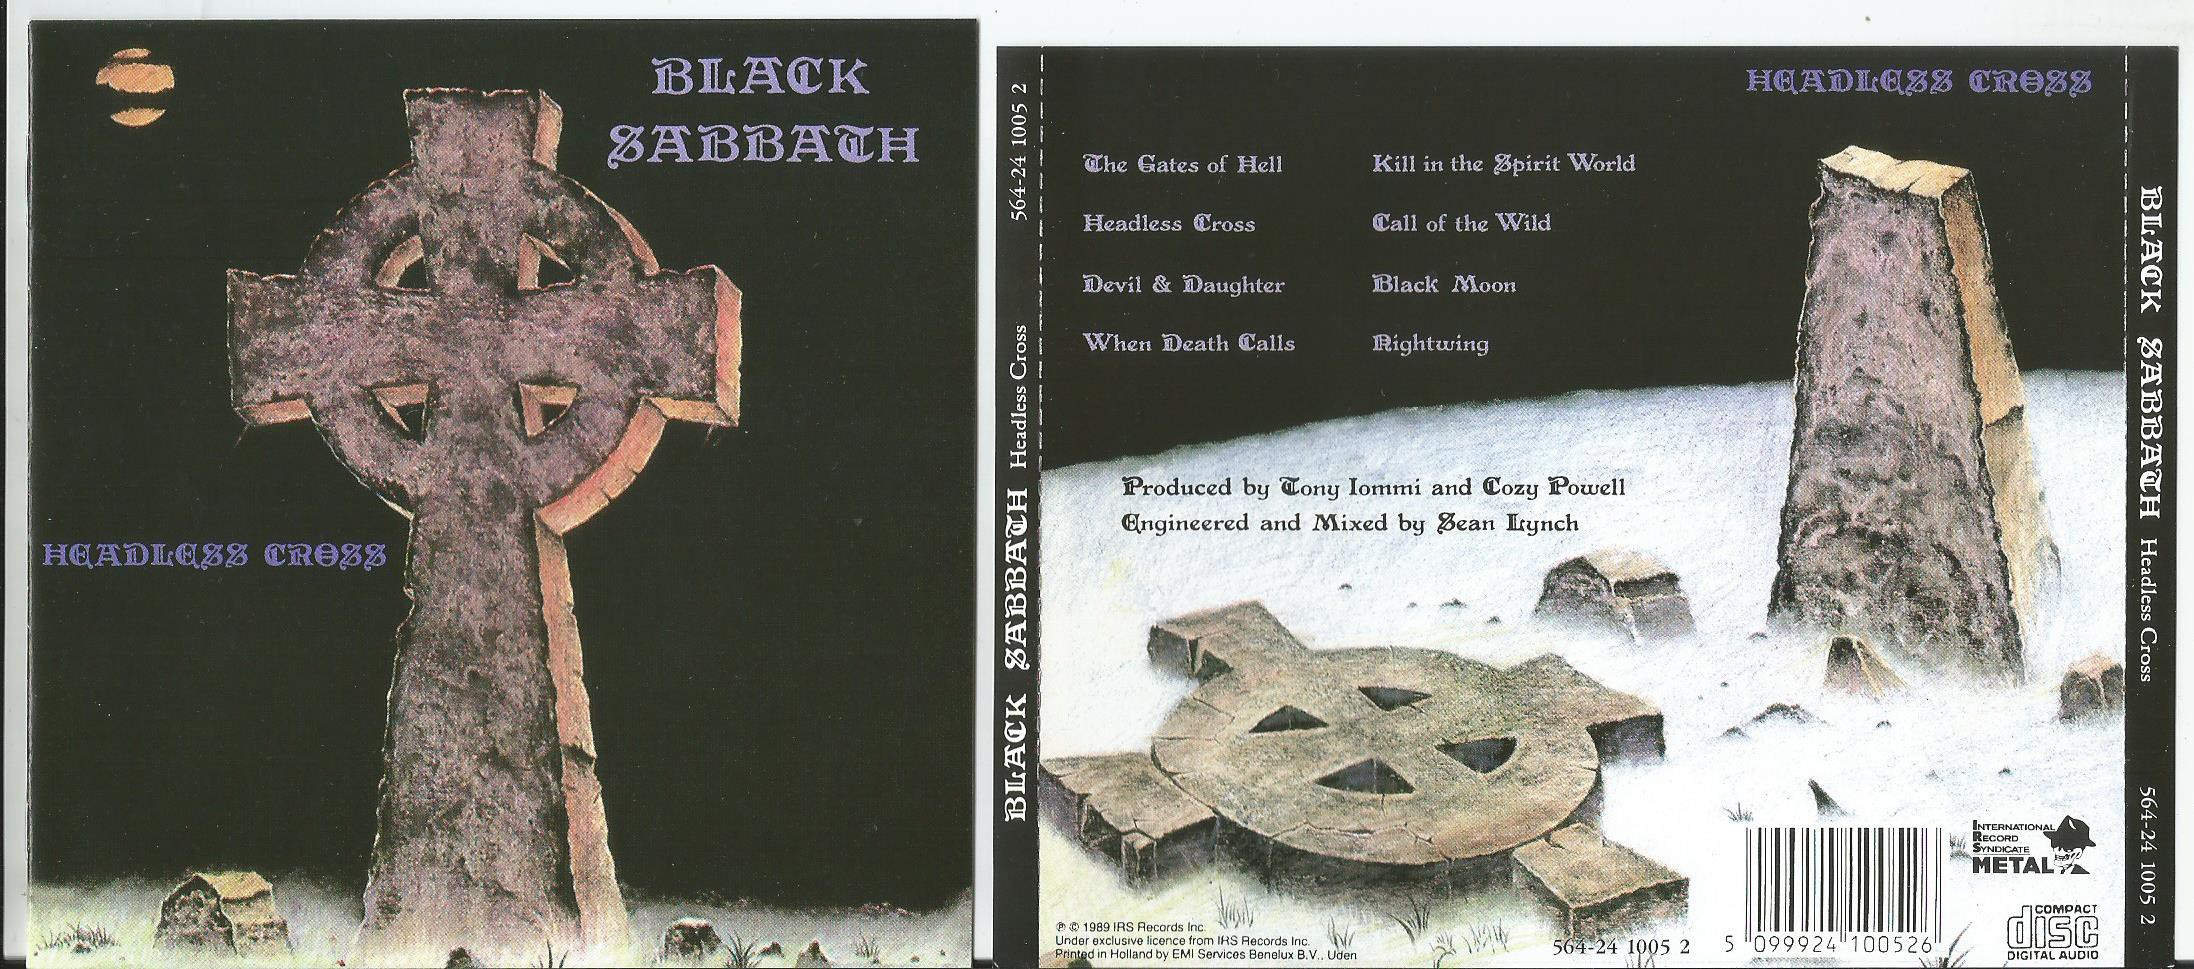 black sabbath headless cross (8page booklet with lyrics)